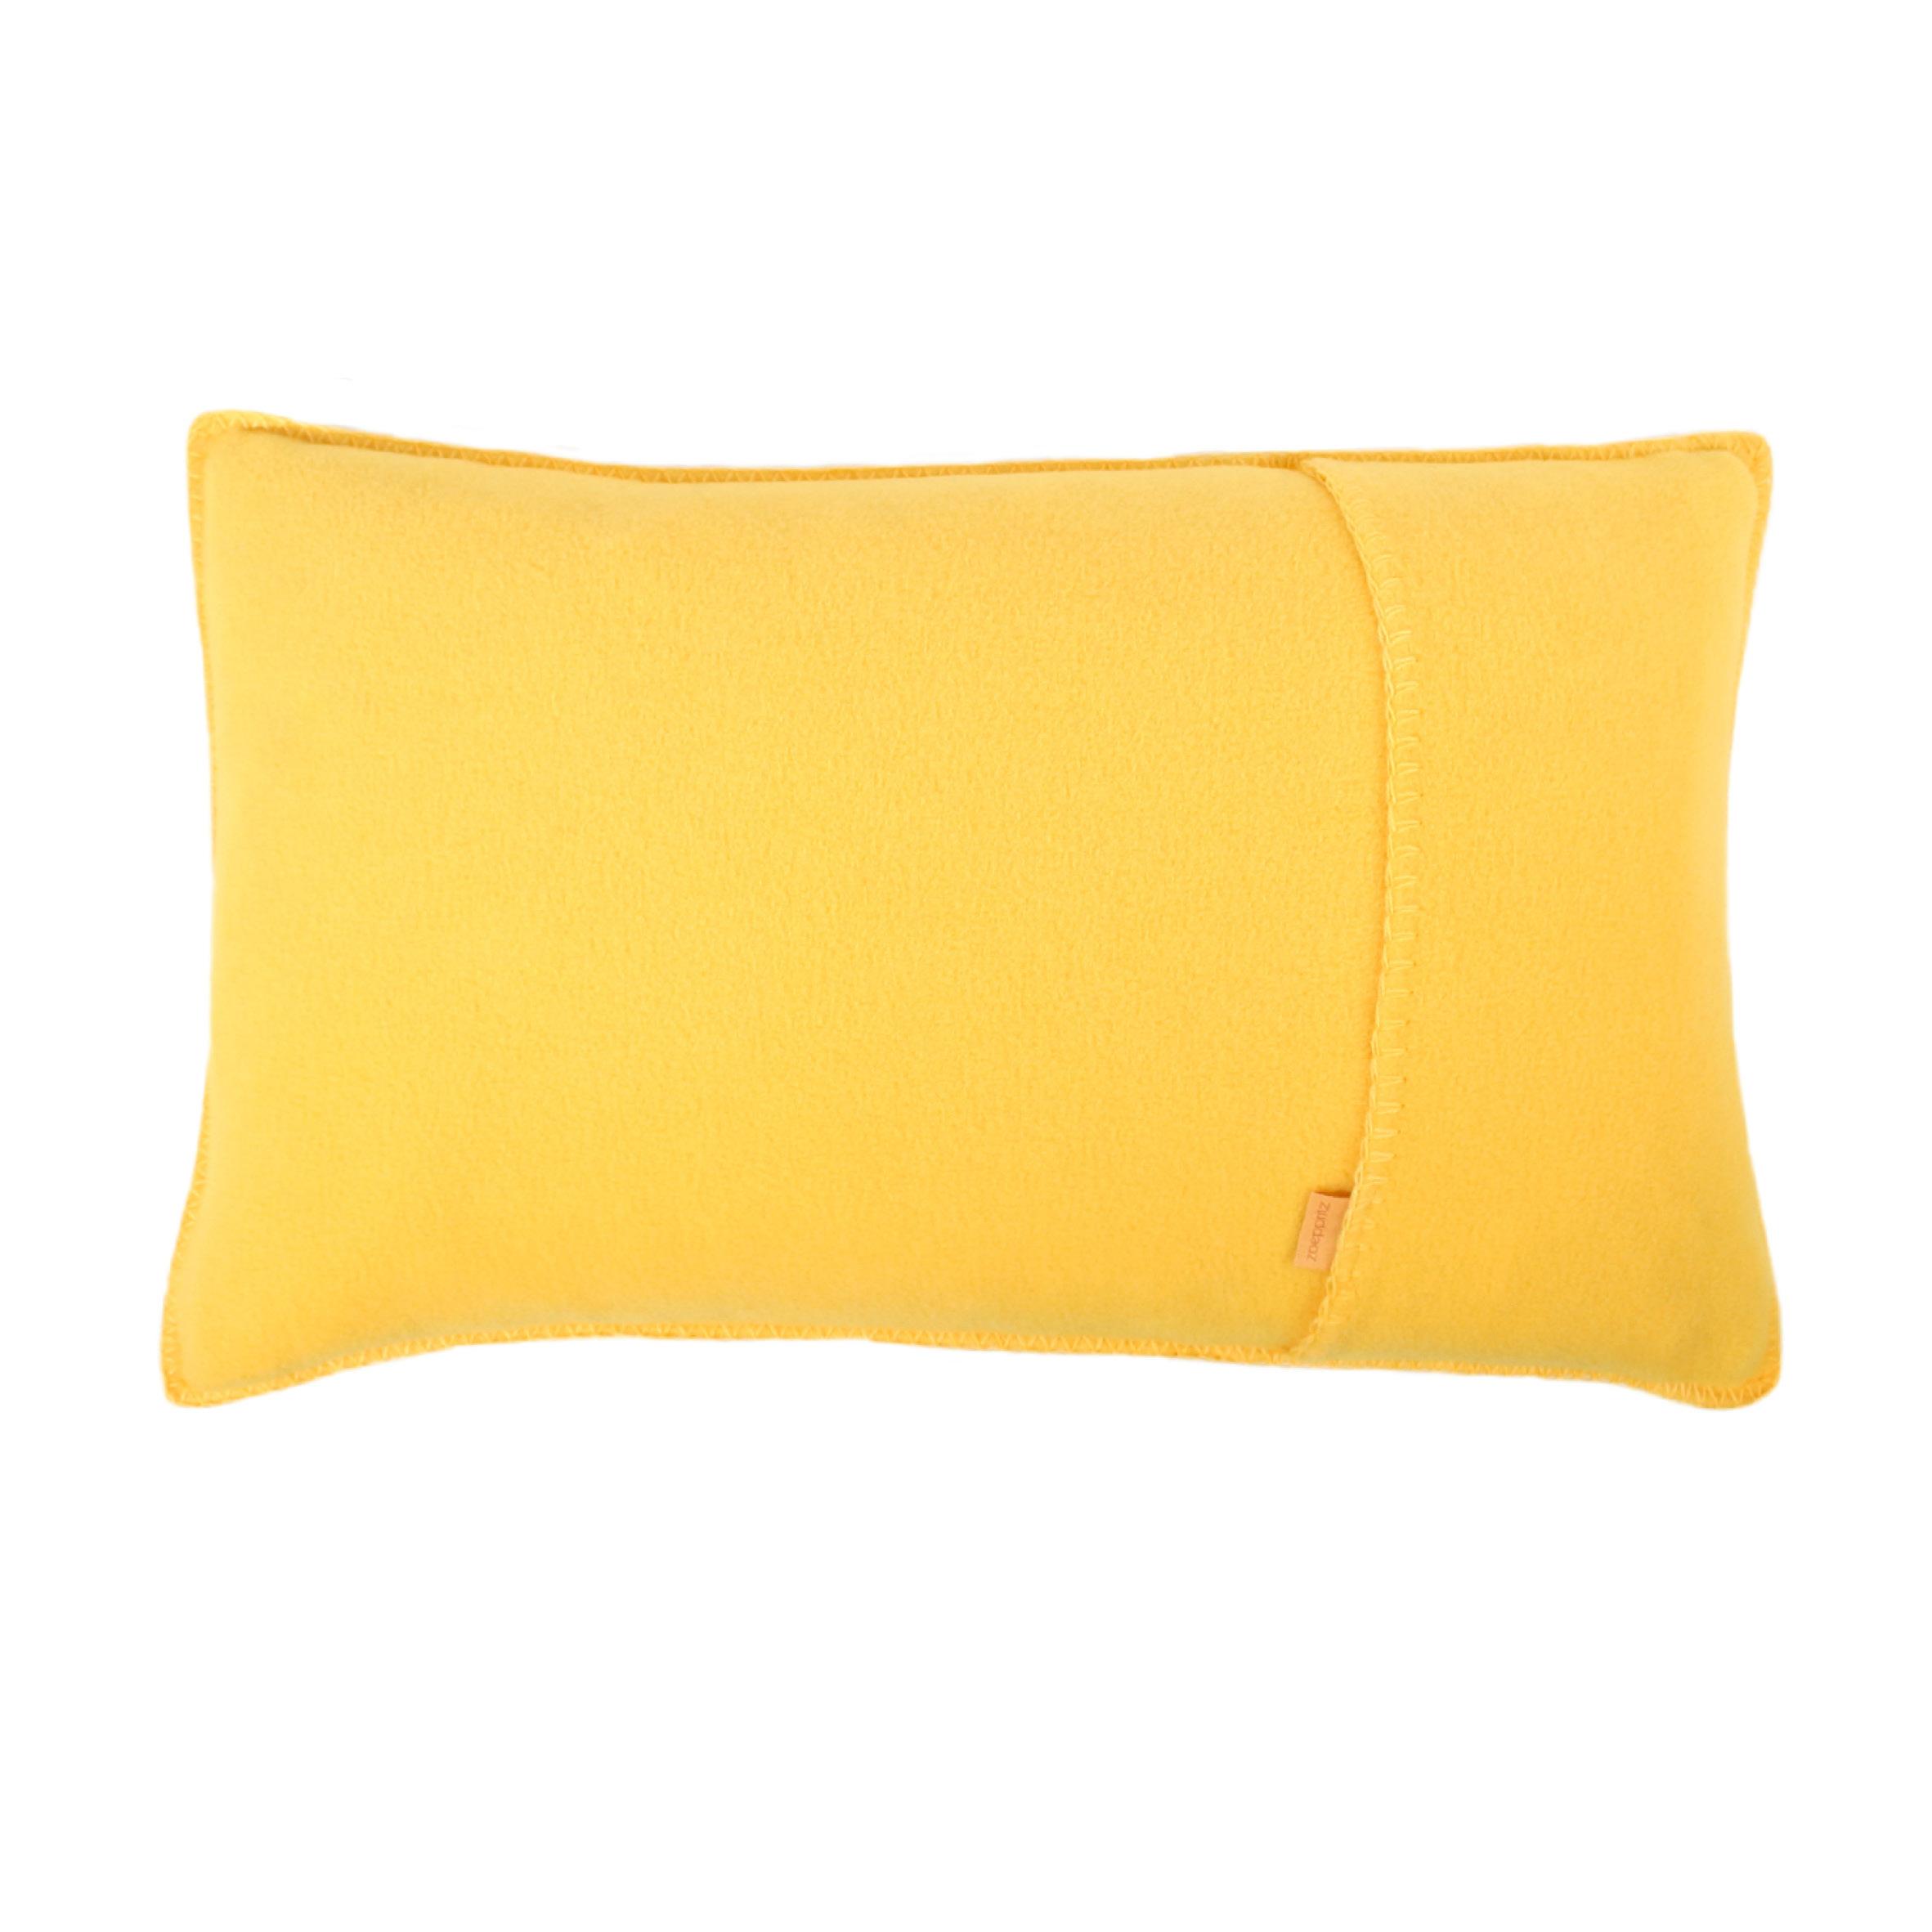 zoeppritz soft fleece kissen 30x50 gelb 2 er set. Black Bedroom Furniture Sets. Home Design Ideas